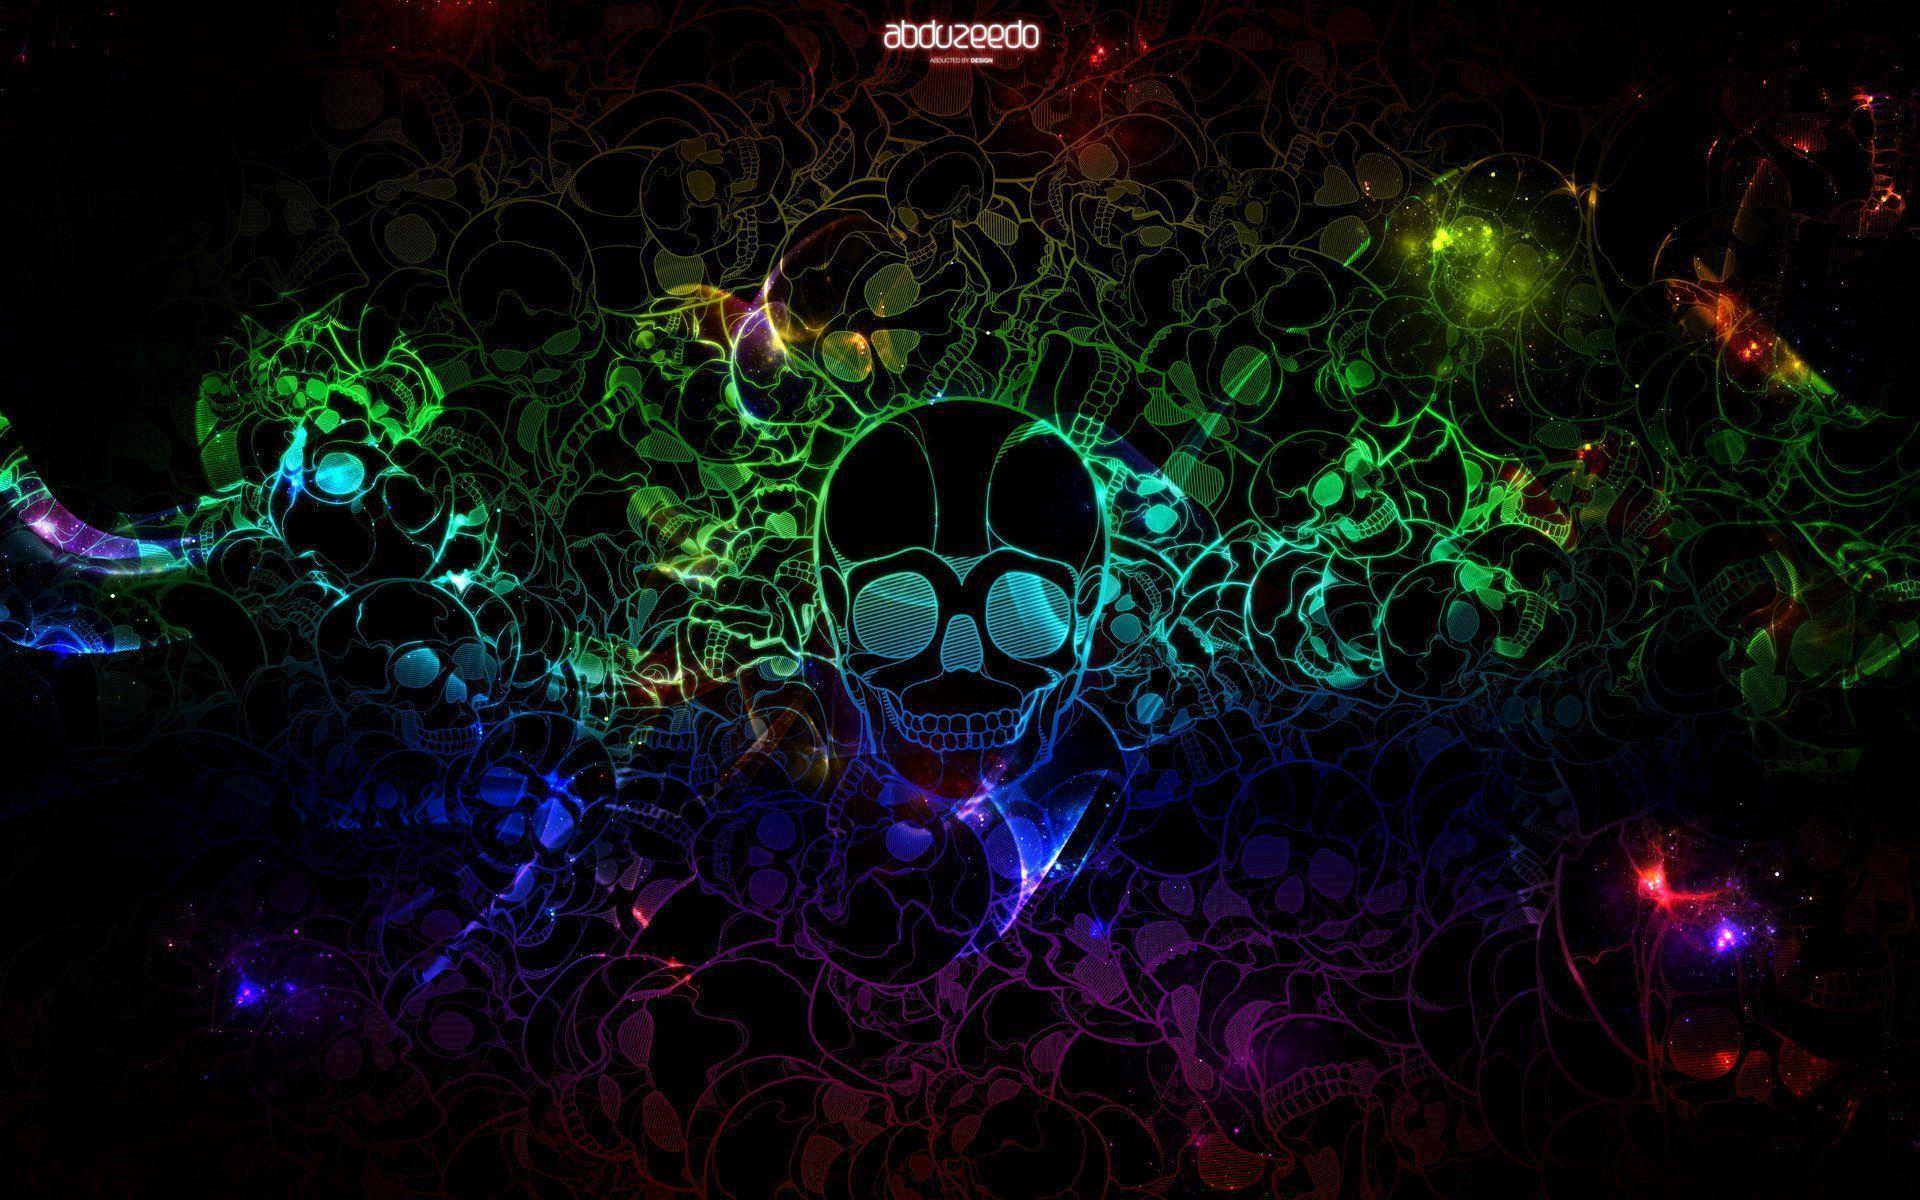 zombie skull wallpapers for desktop - photo #19